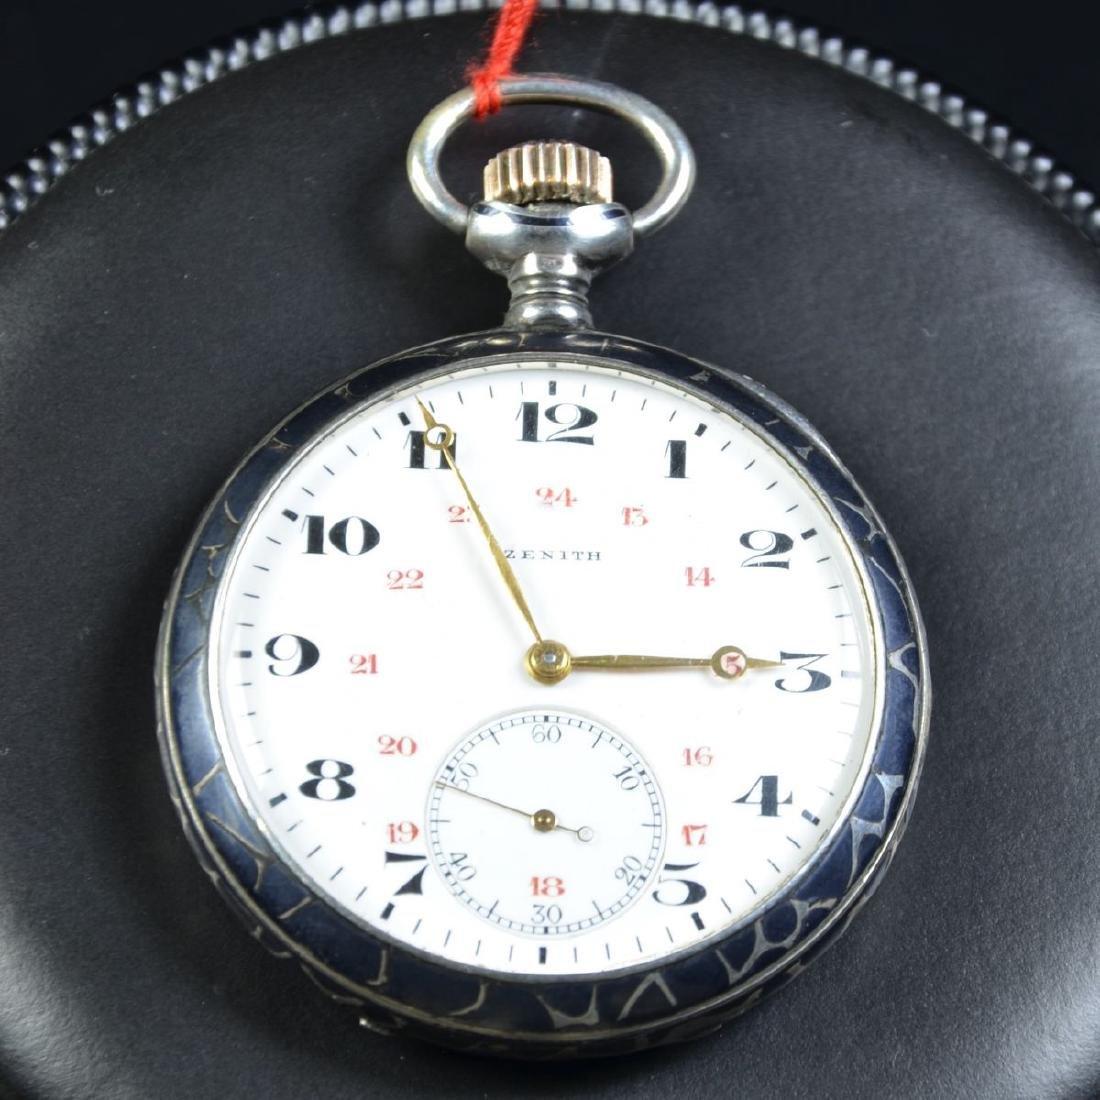 Pocket watch ZENITH in good condition.